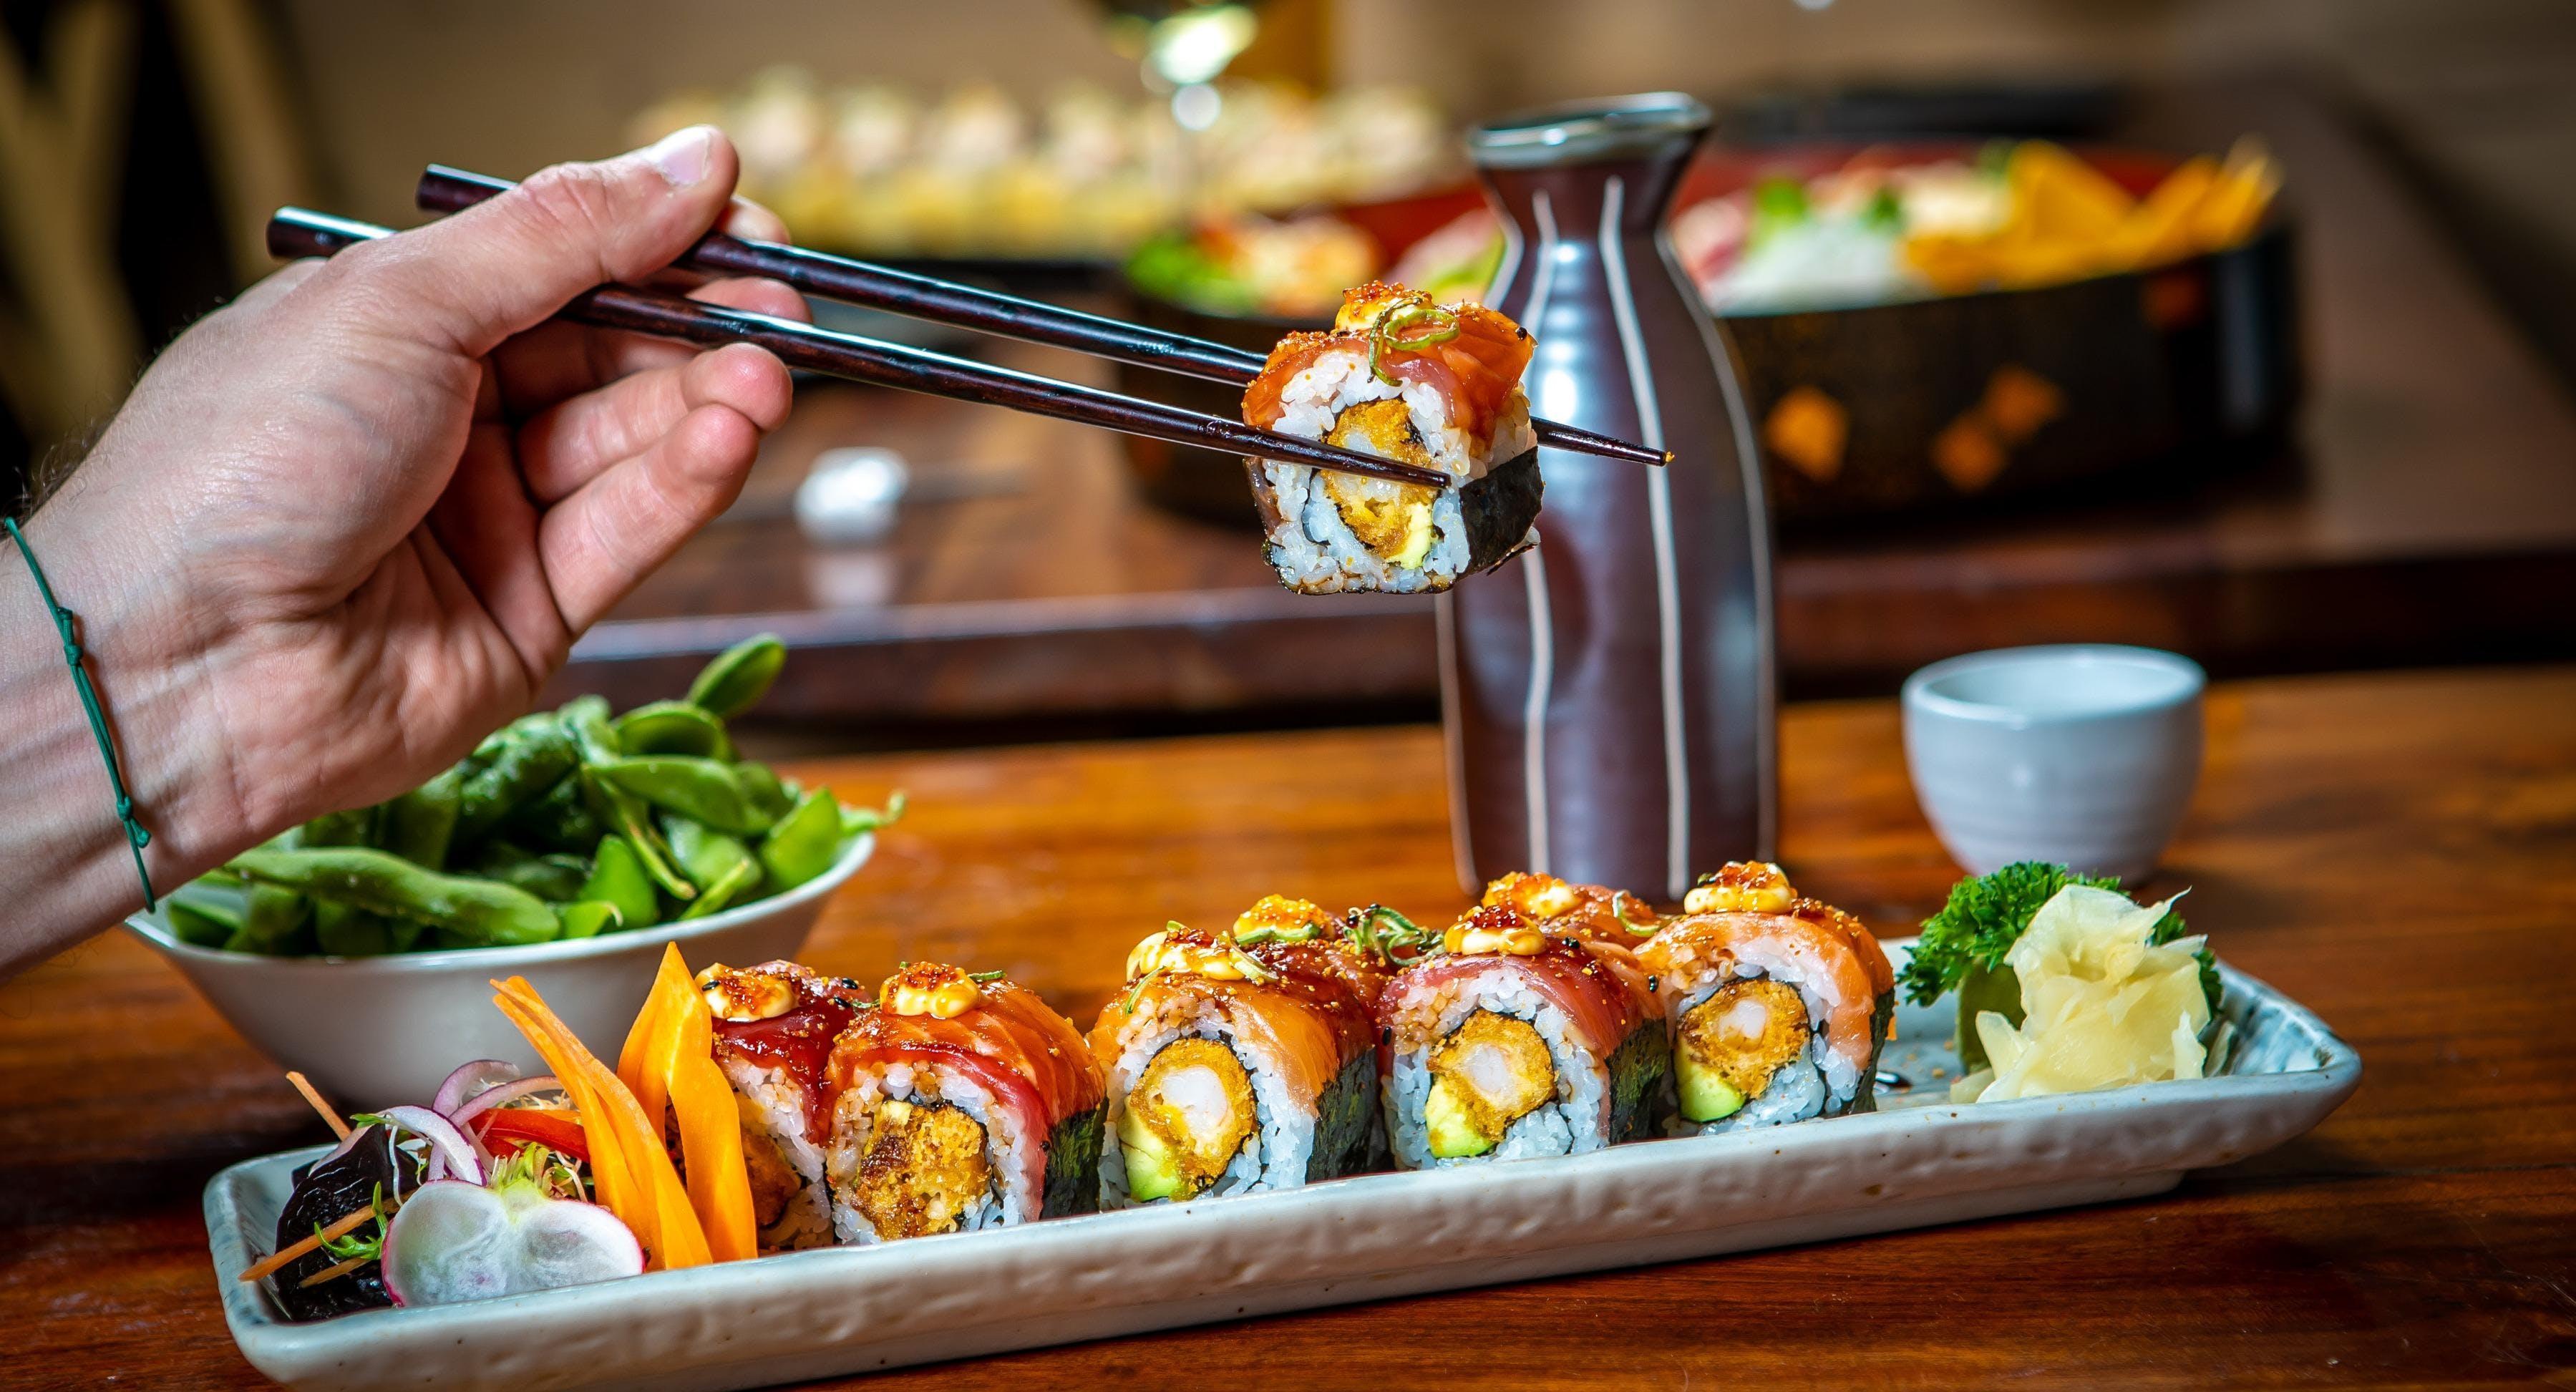 Ichika-Sushi & Asian Cuisine Melbourne image 2